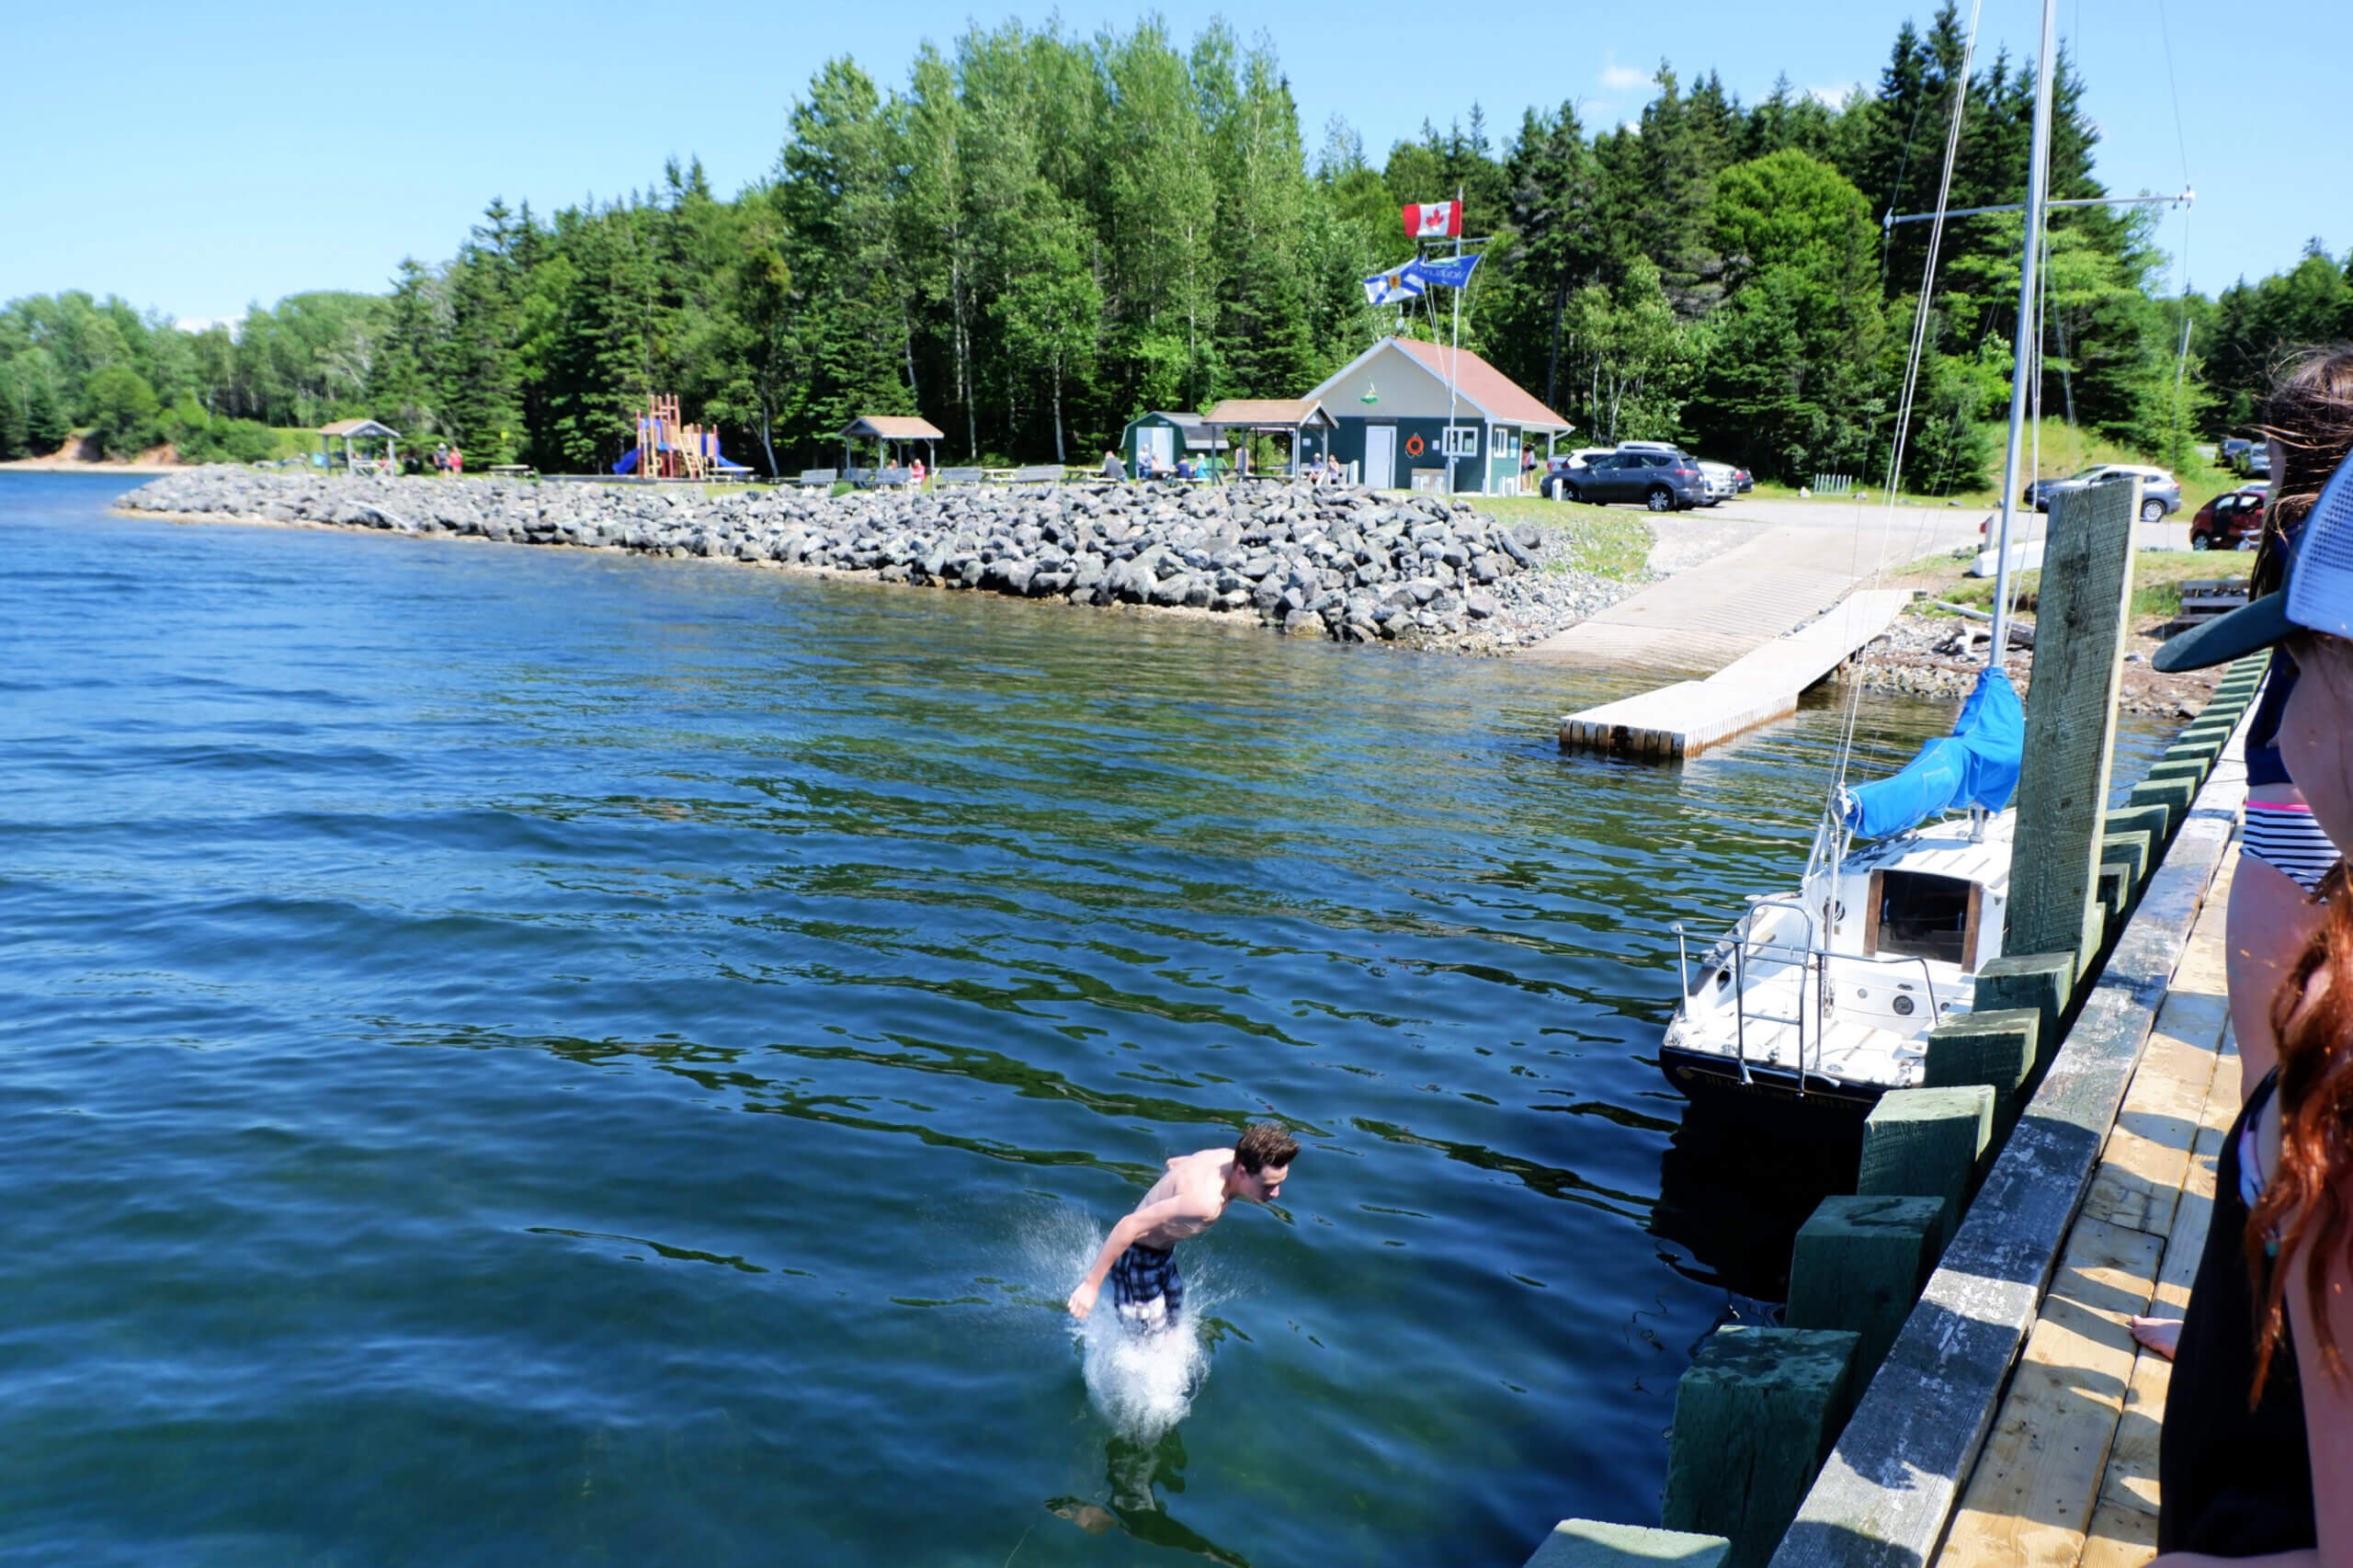 teen jumping off wharf at ross ferry marine park playground cape breton nova scotia